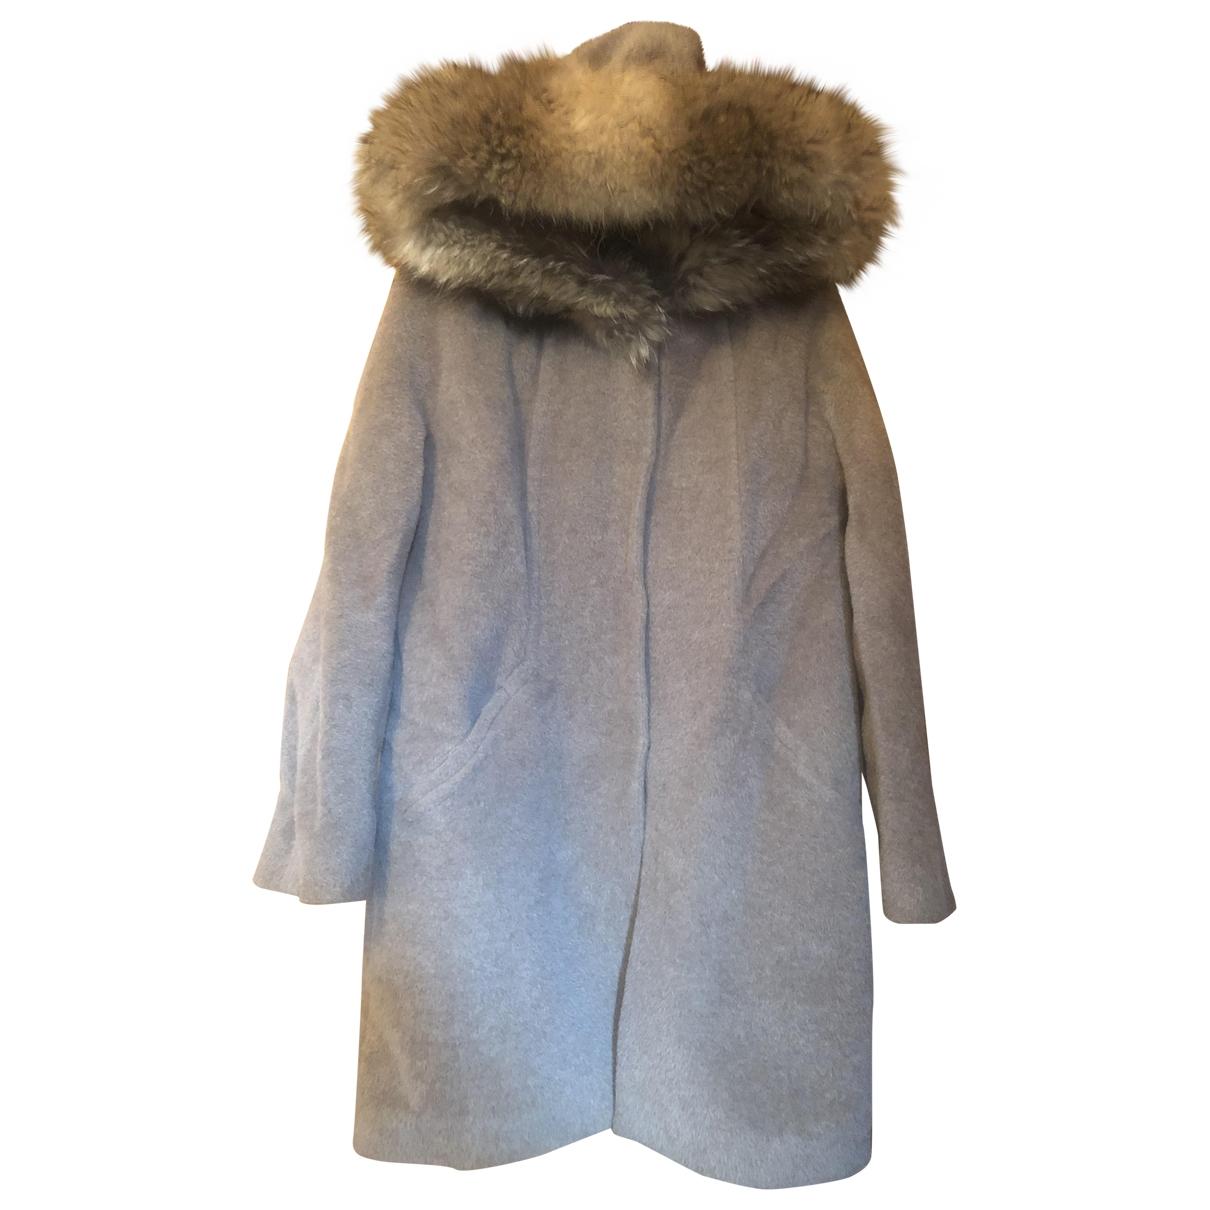 Sprung Frères \N Brown Fur coat for Women 38 FR